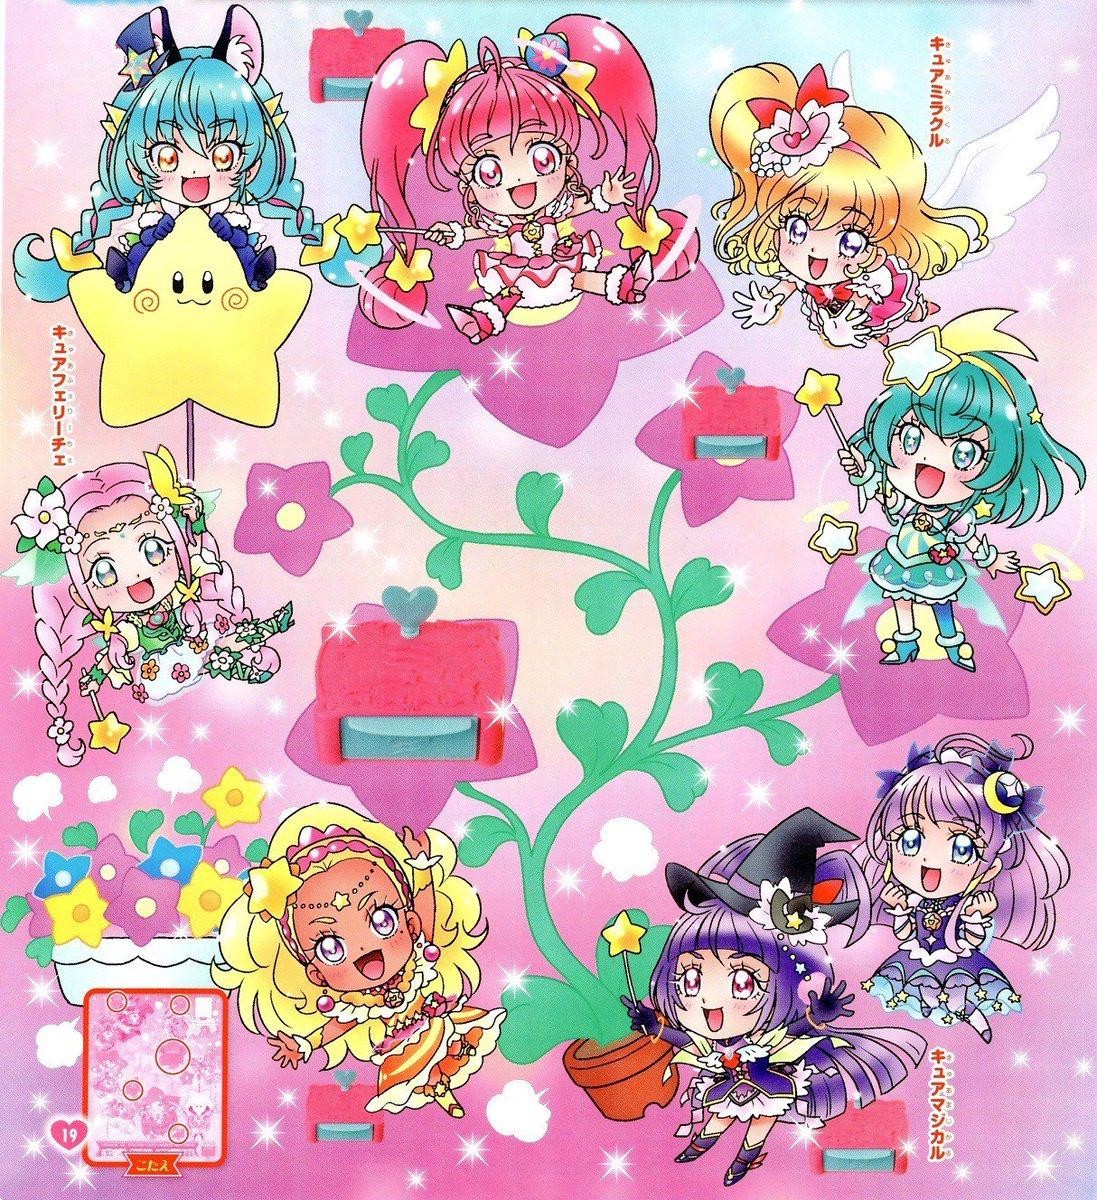 RT @KyuaGuardians: Chibis Star ⭐ Twinkle Precure y Mahou Tsukai Precure! 😍💖 #Precure https://t.co/GBYXptgrog